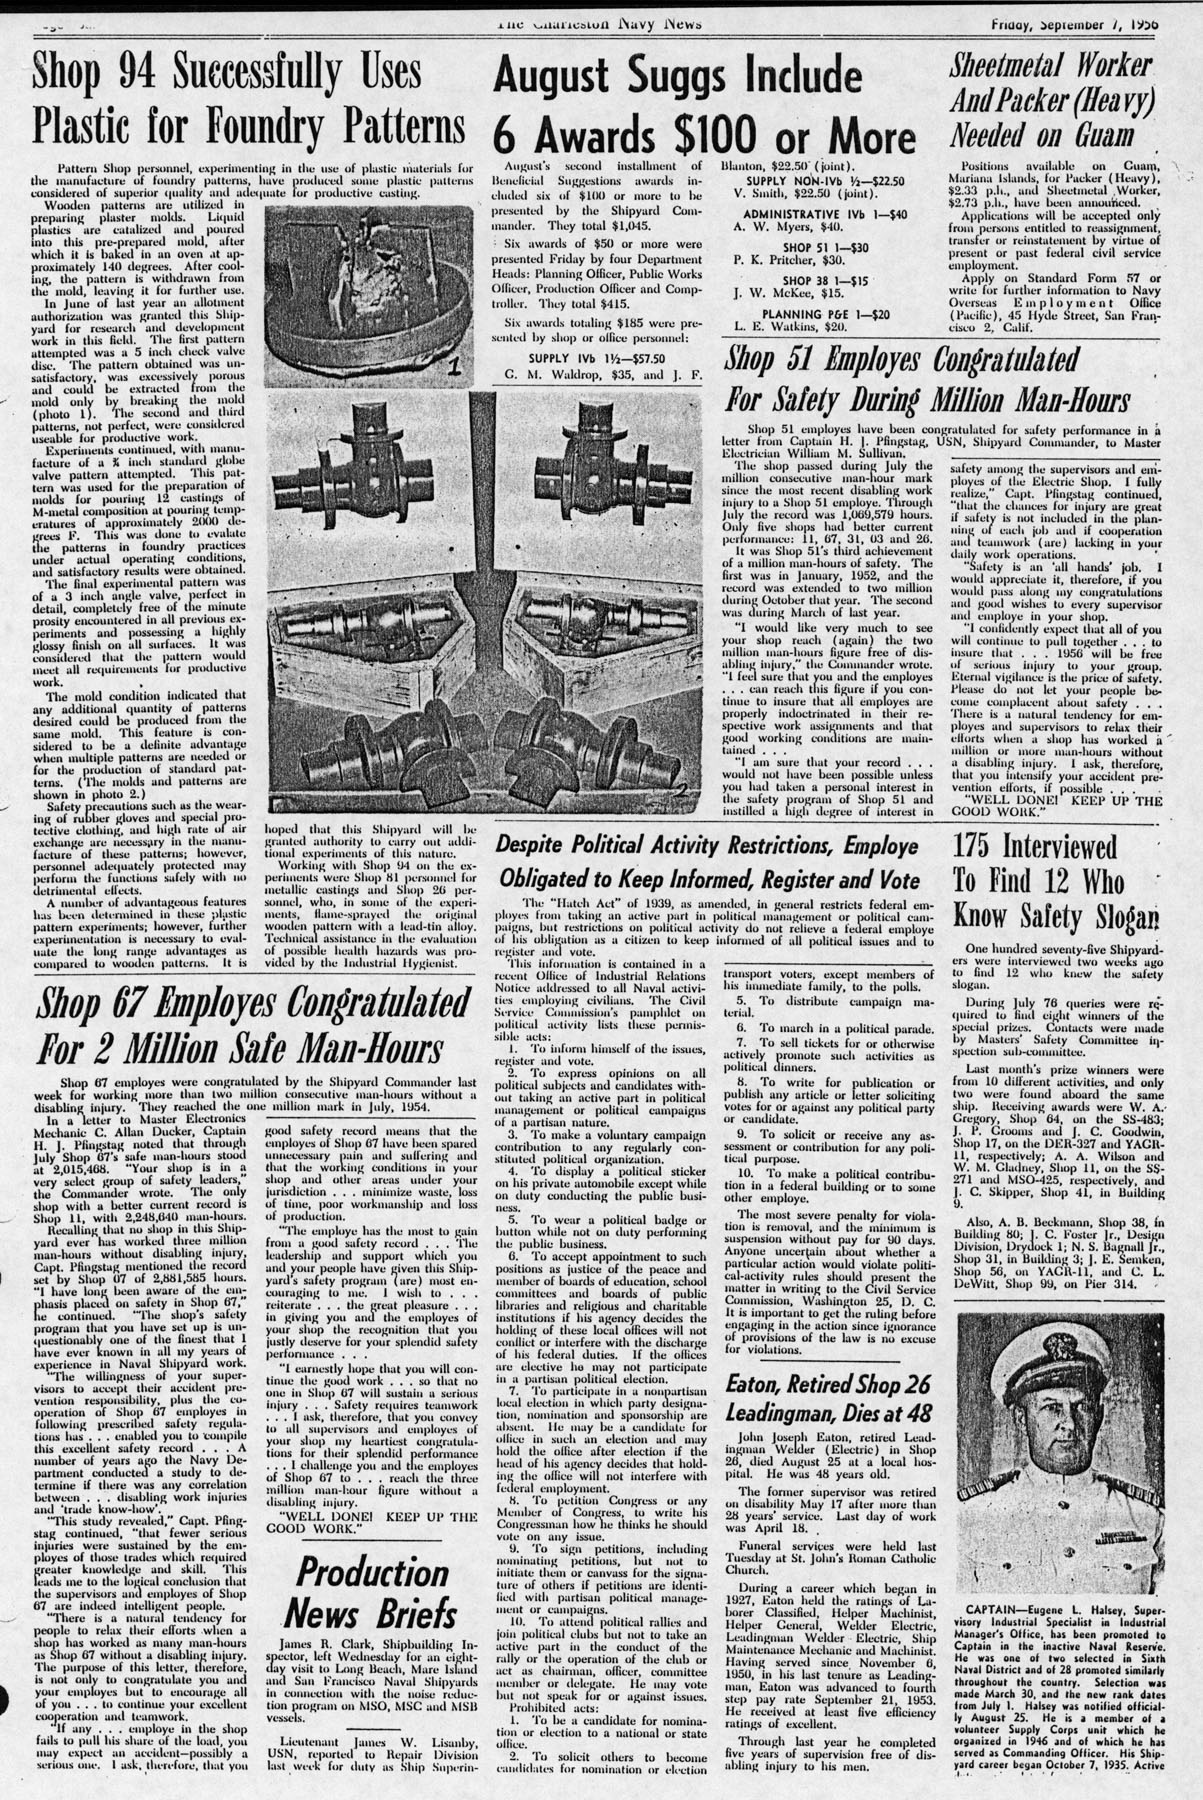 The Charleston Navy News, Volume 15, Edition 4, page iv